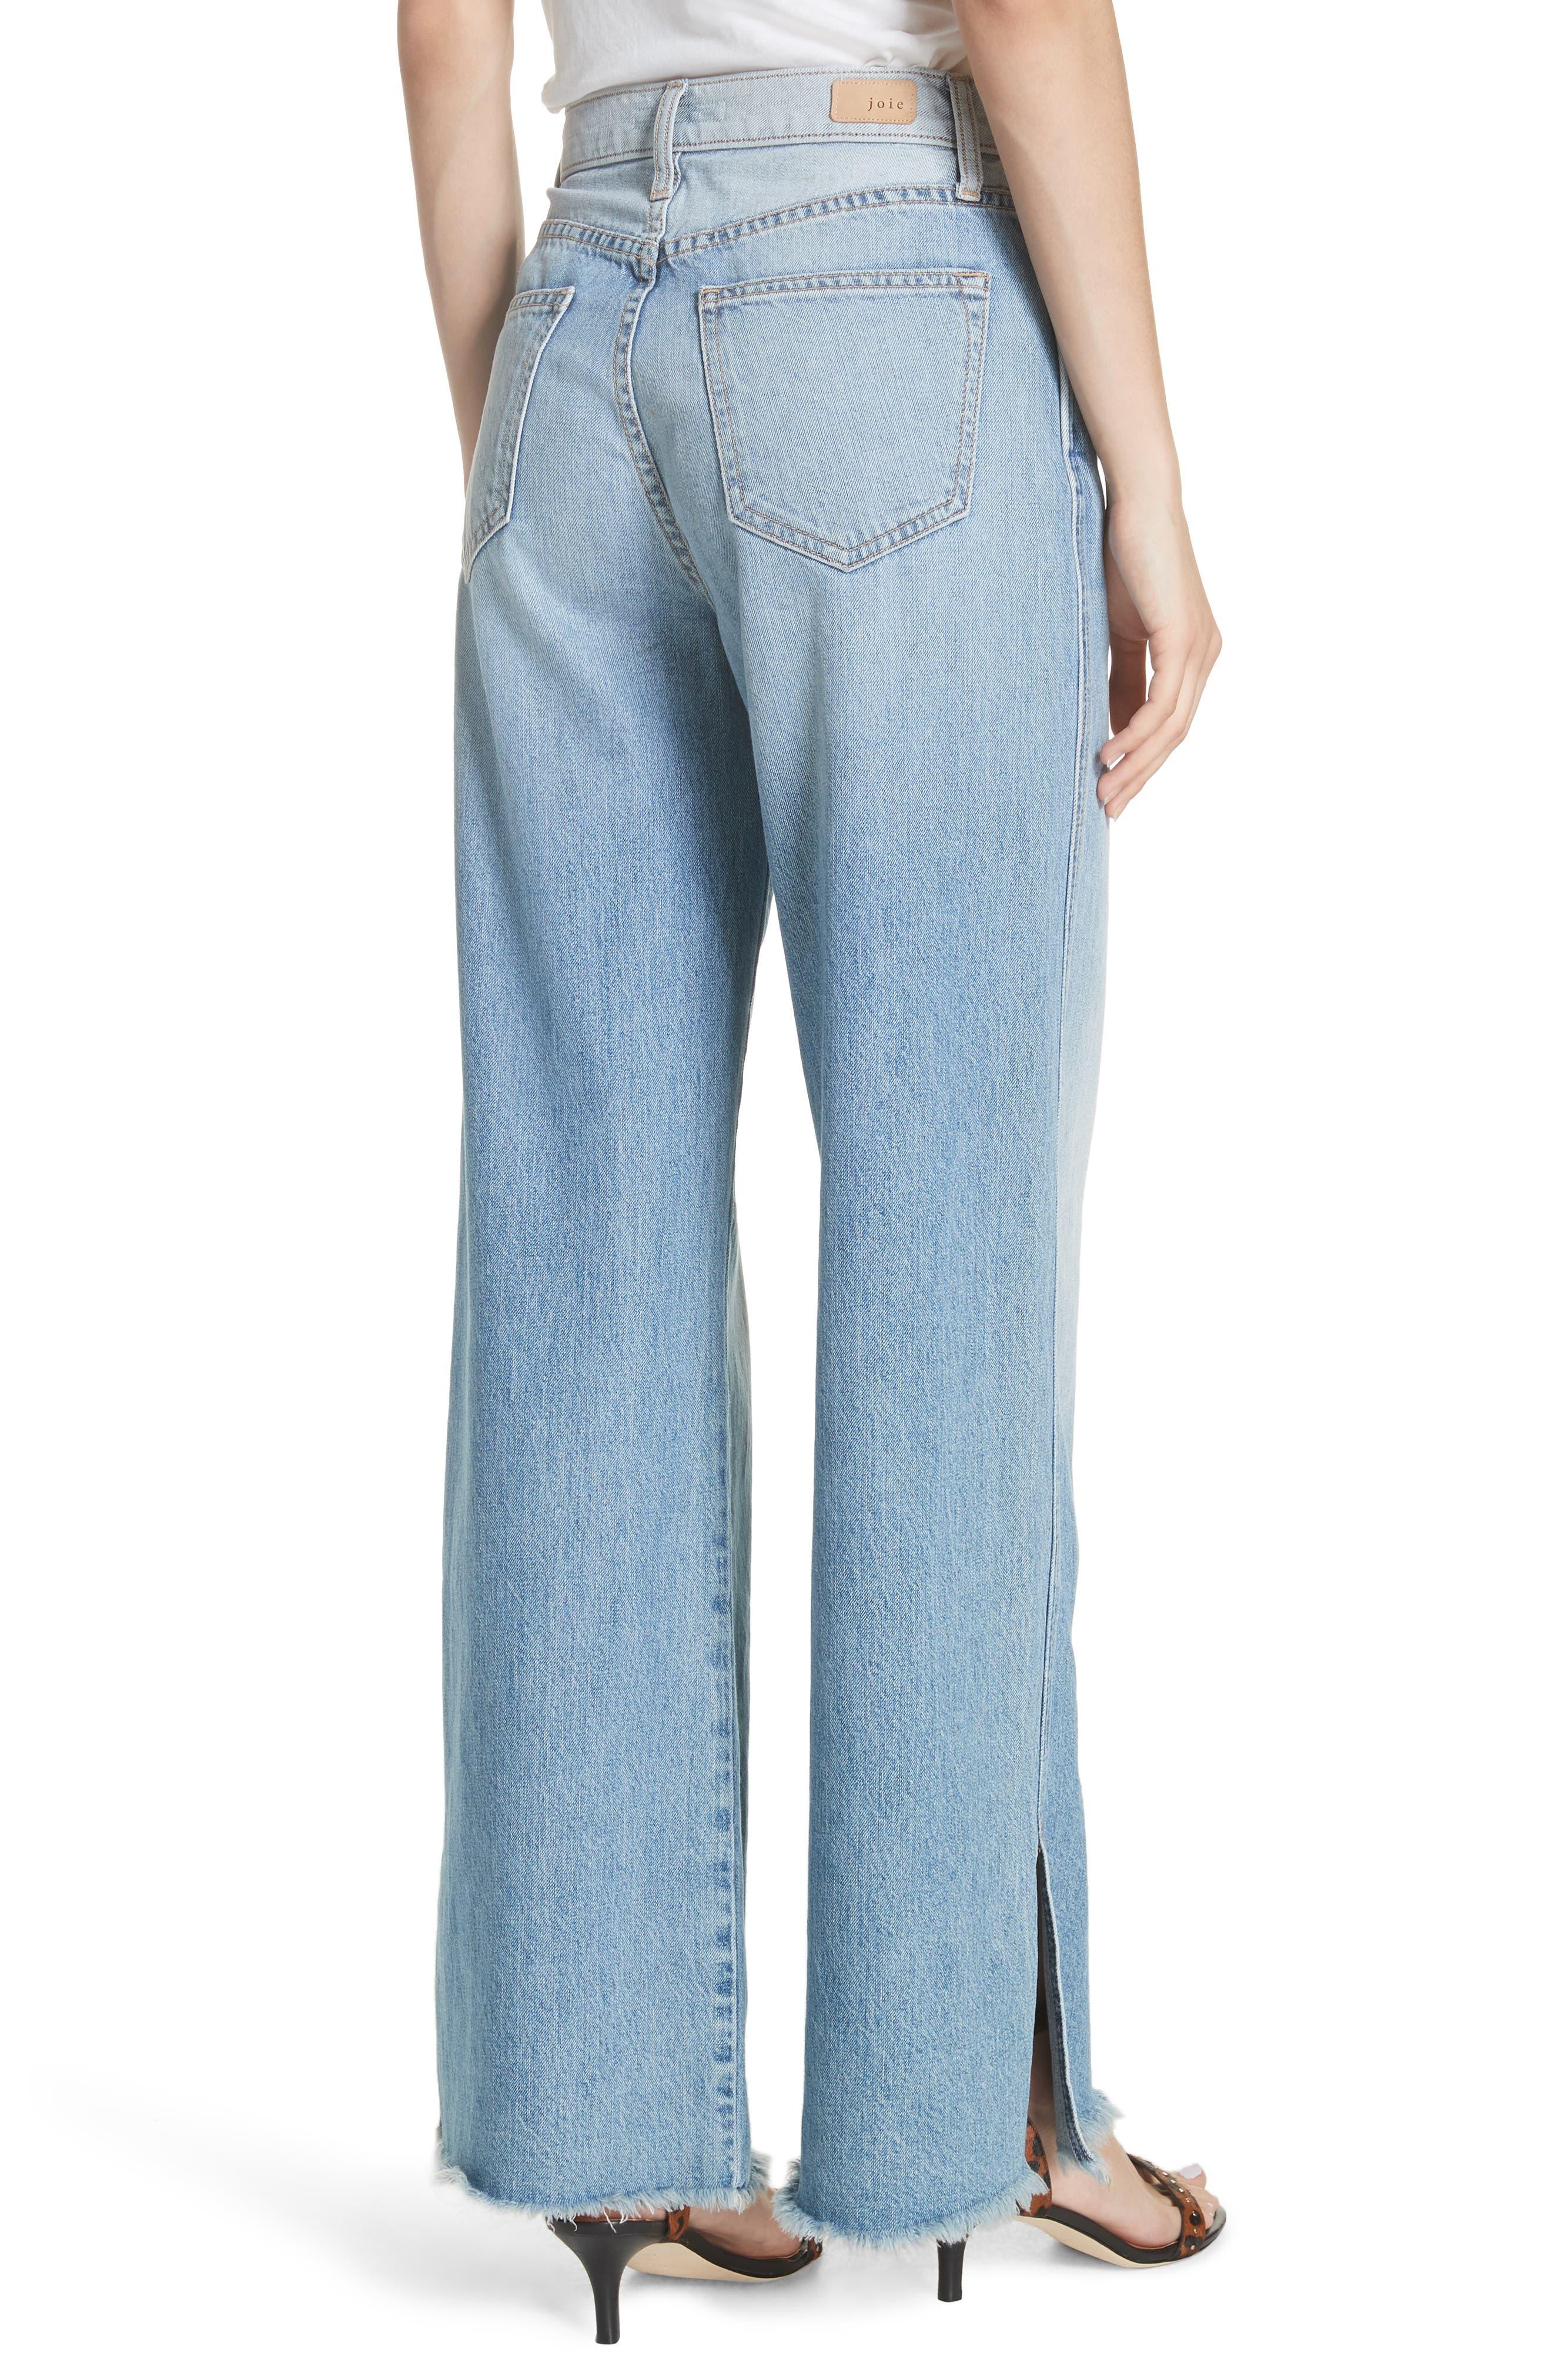 Isemene Wide Leg Jeans,                             Alternate thumbnail 2, color,                             450